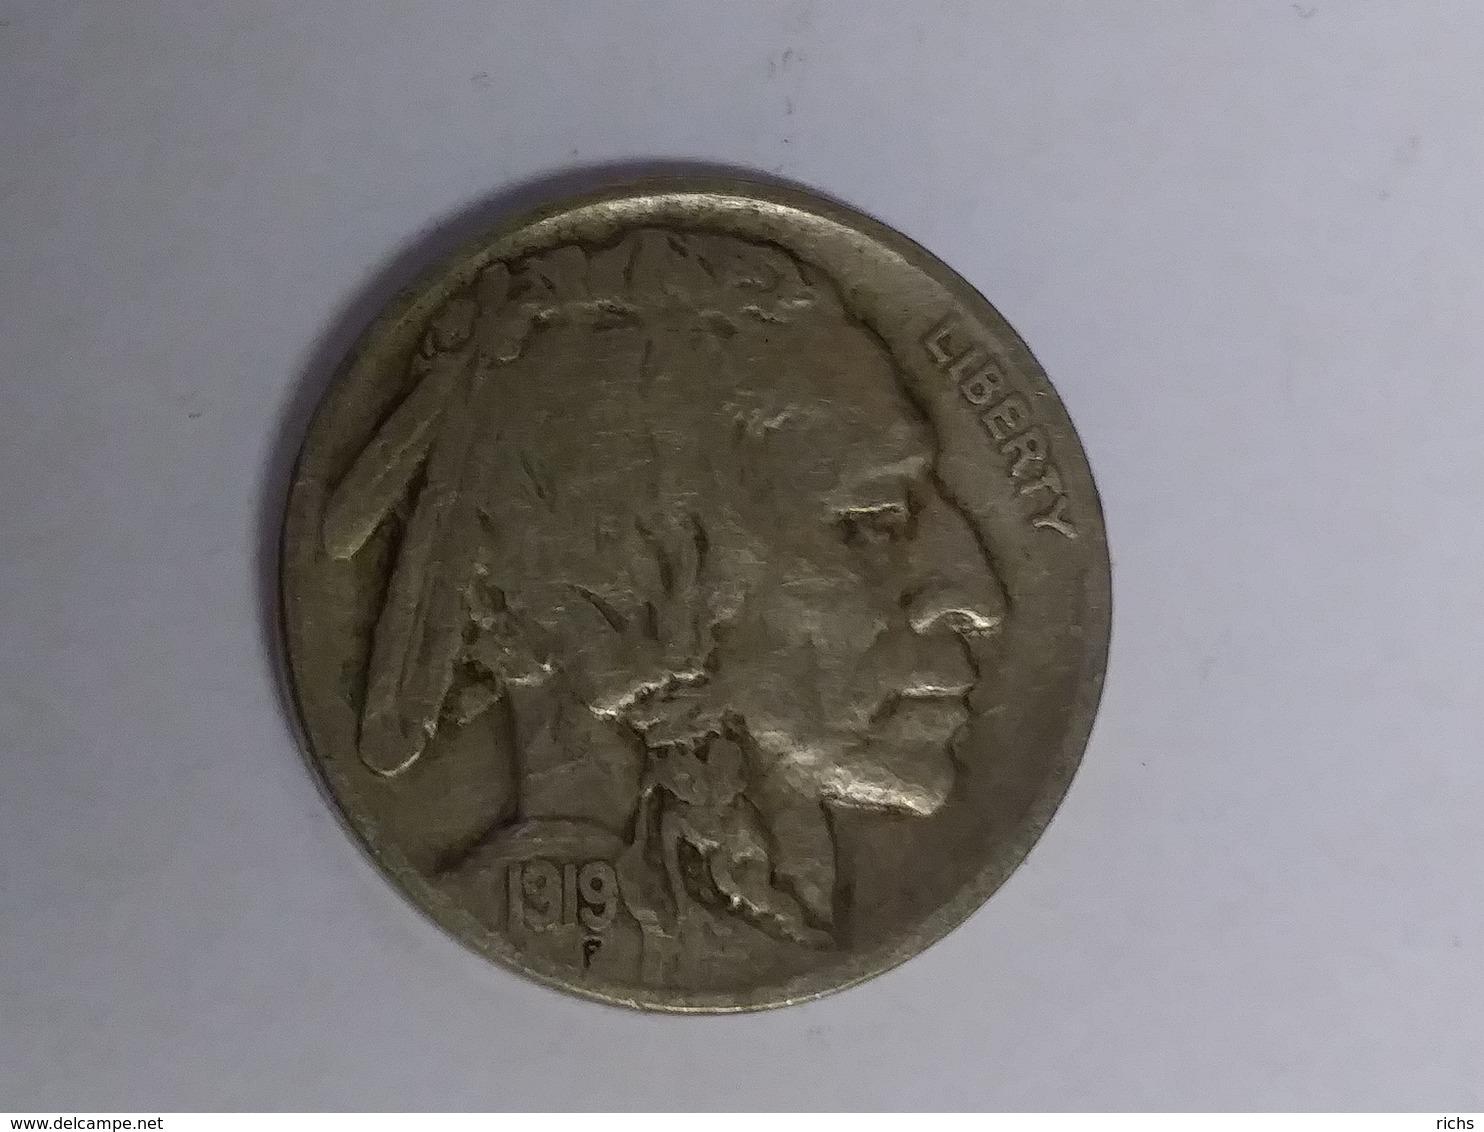 1919 Buffalo Nickel - Bondsuitgaven